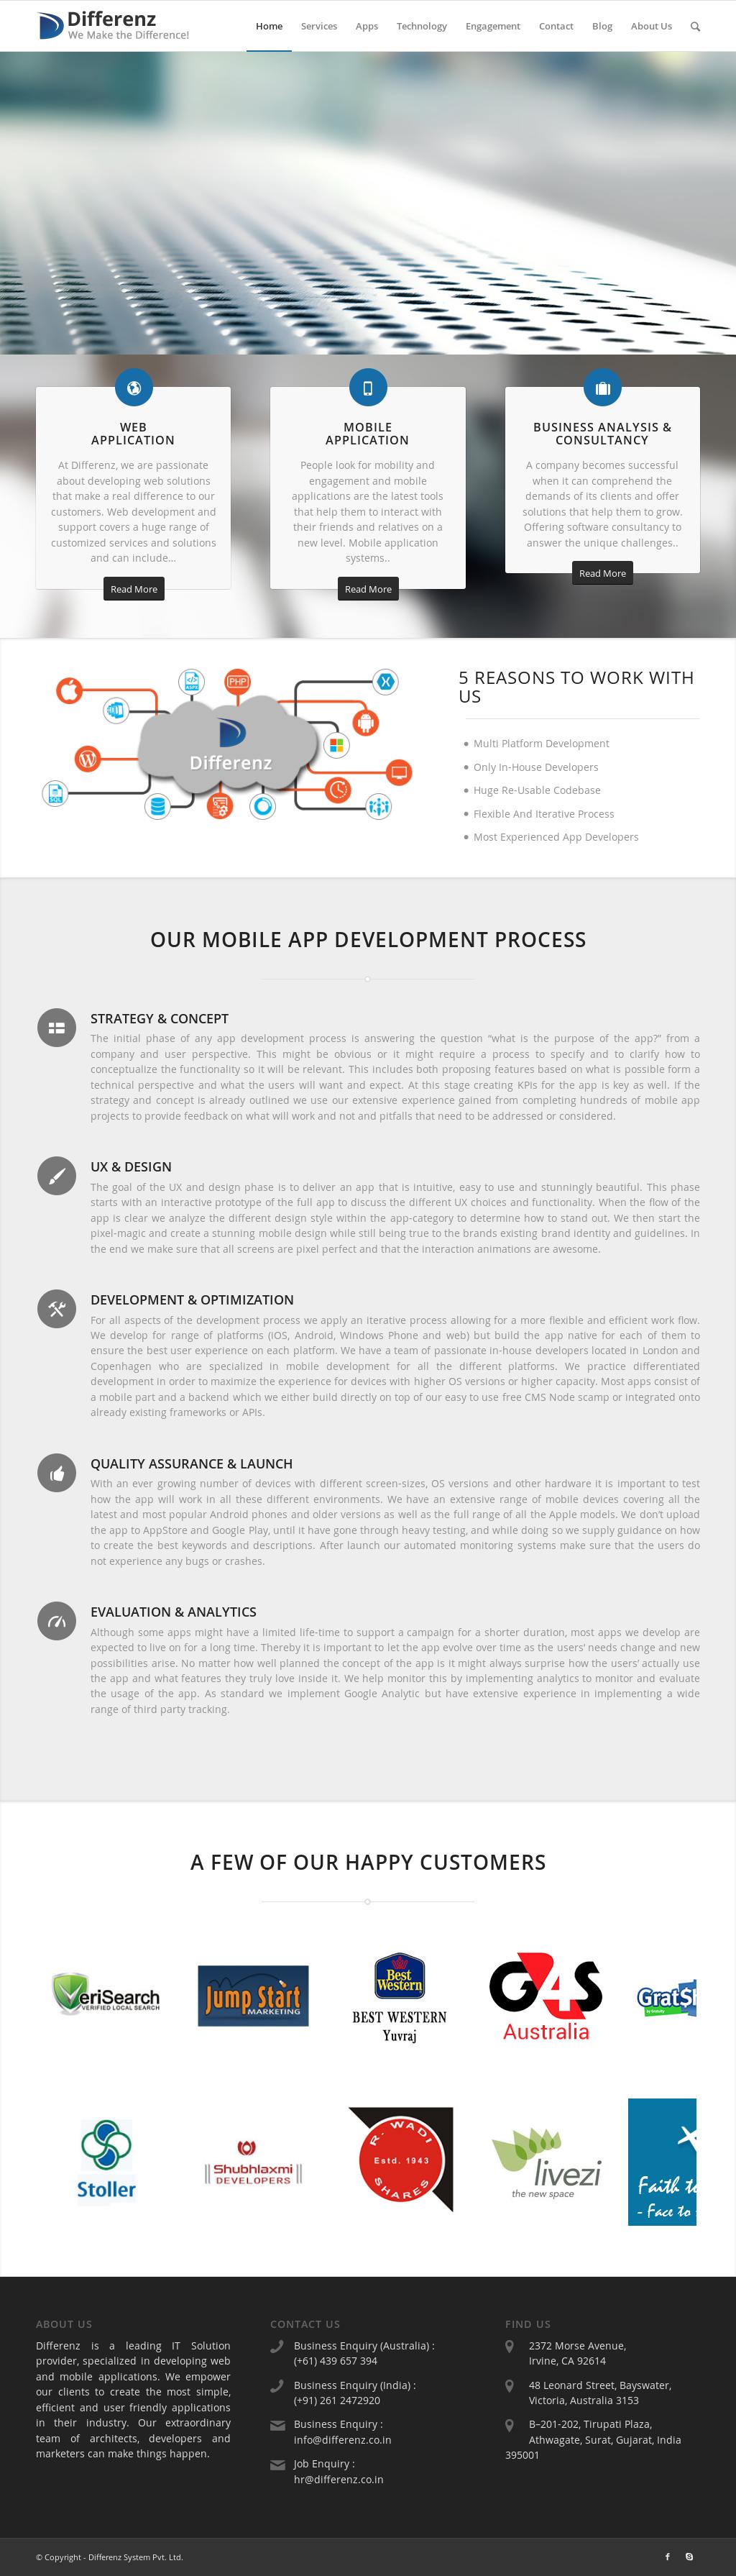 Software Companies Virginia Beach